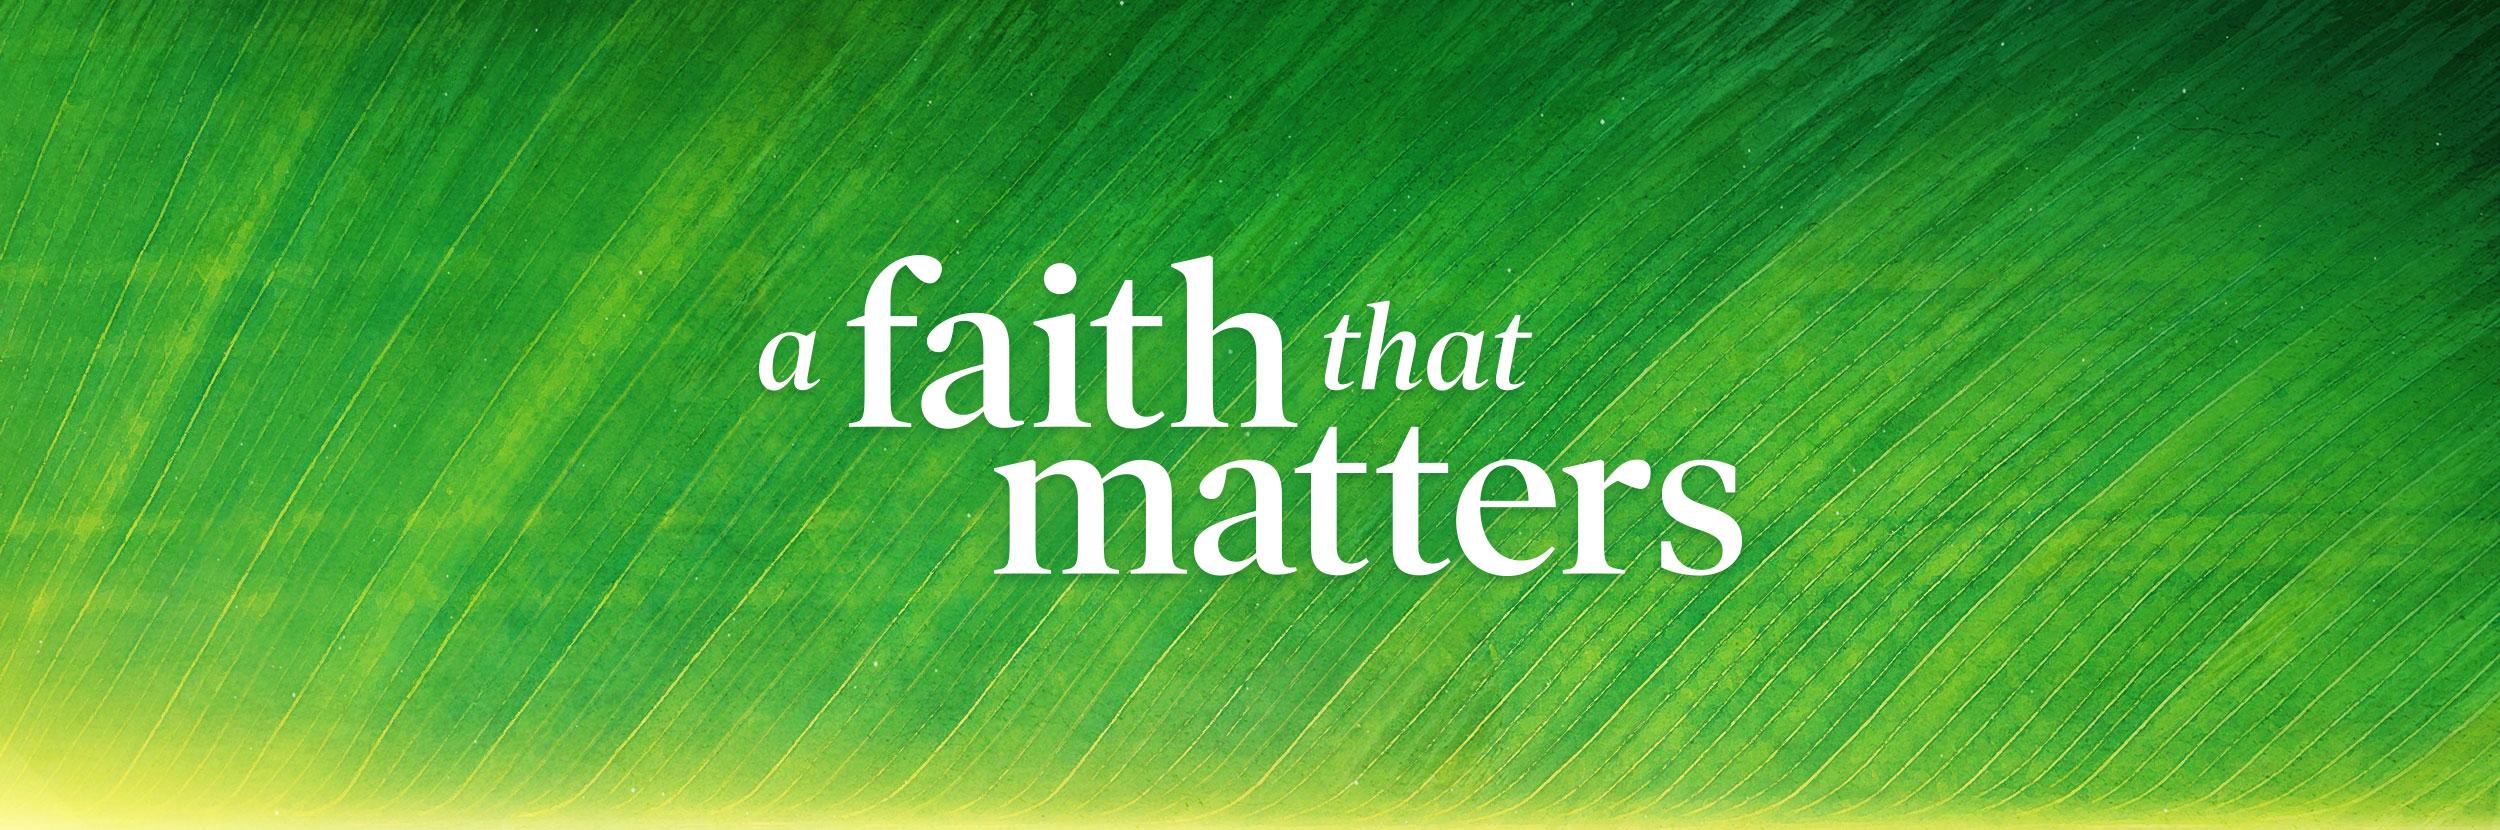 a-faith-that-matters-banner-2500x830.jpg